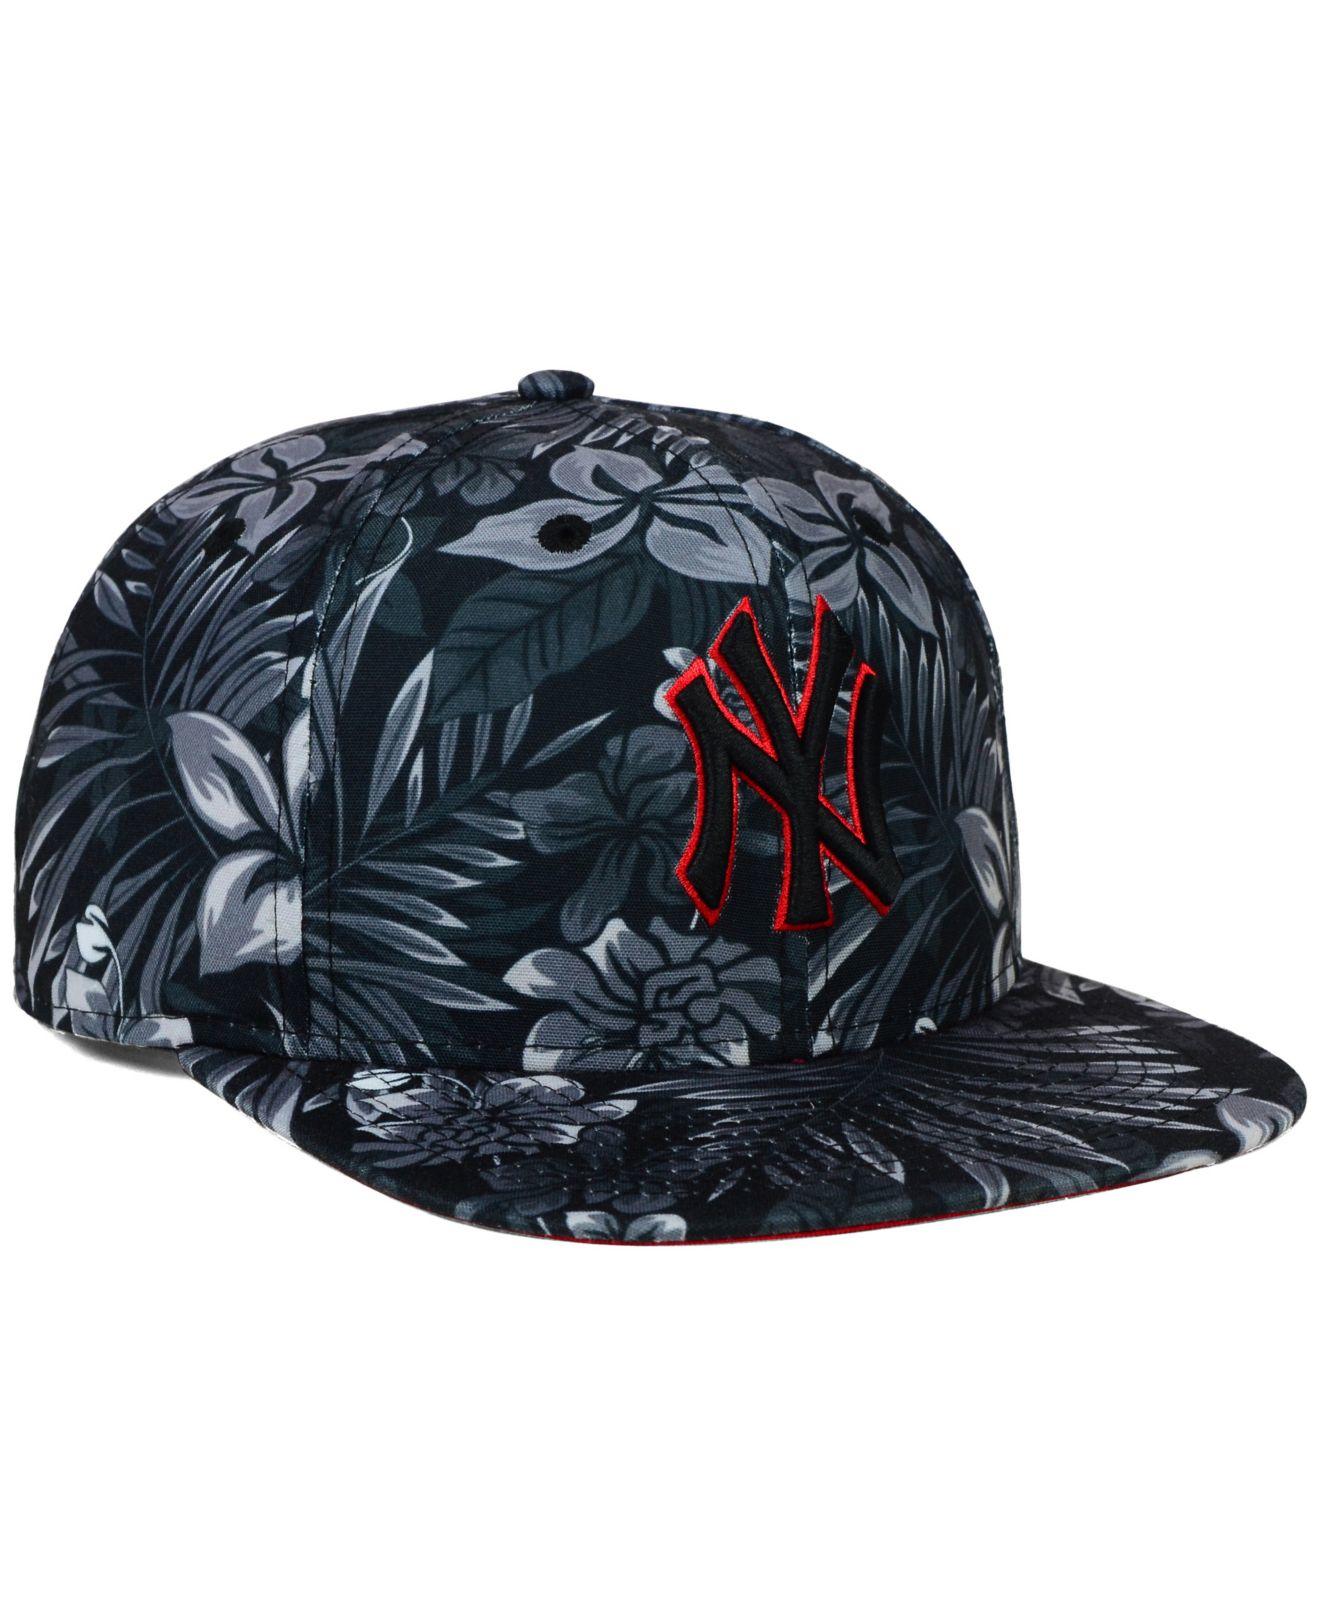 7d502fa1fc3 ... wholesale lyst ktz new york yankees night tropic 9fifty snapback cap in  ec1ed 83fe3